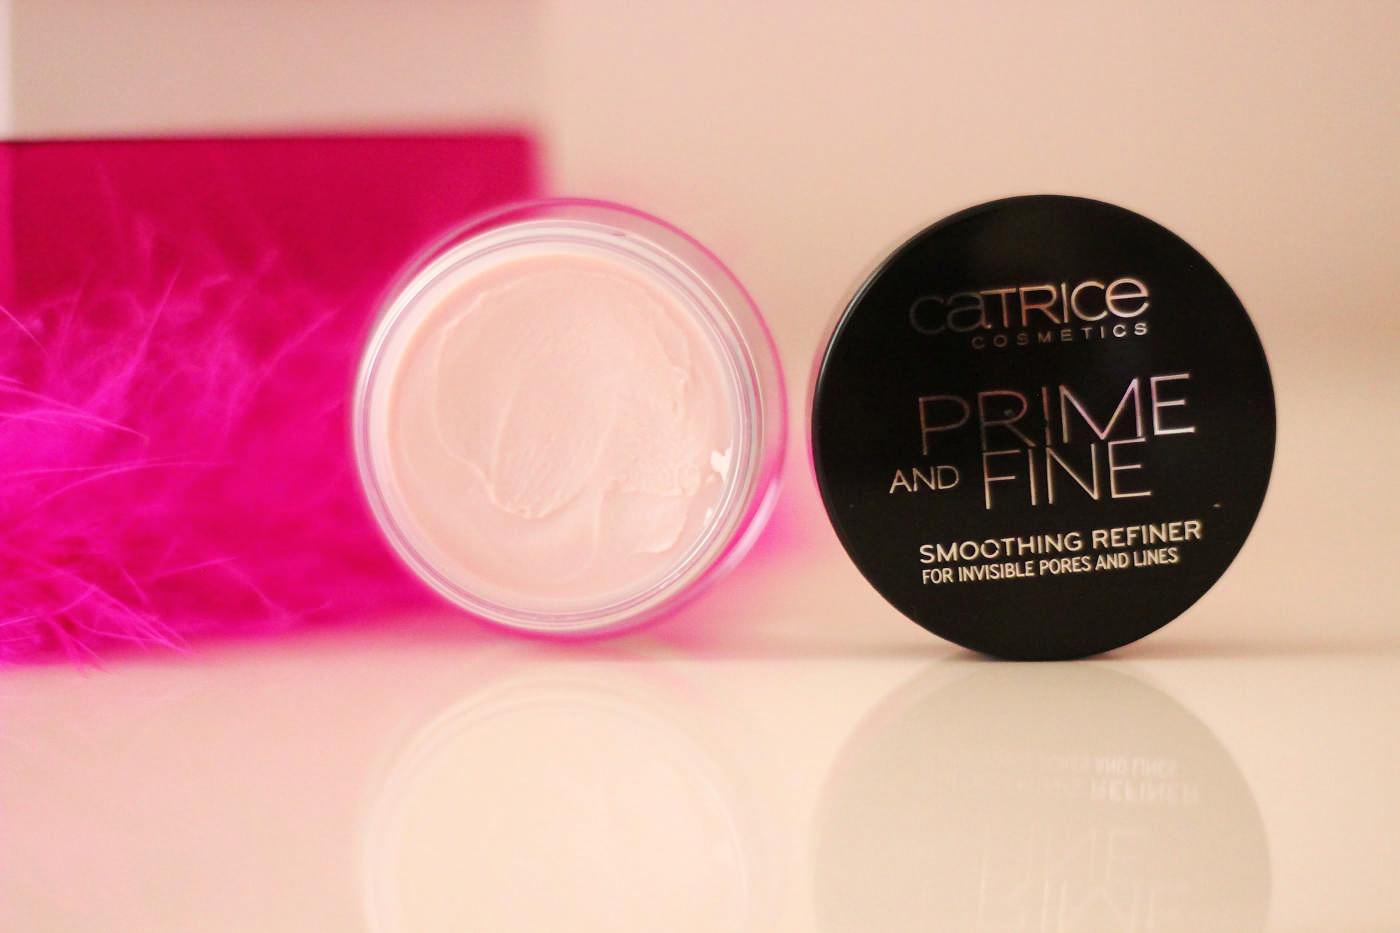 catrice-prime and fine-gözenekler için makyaj bazı.